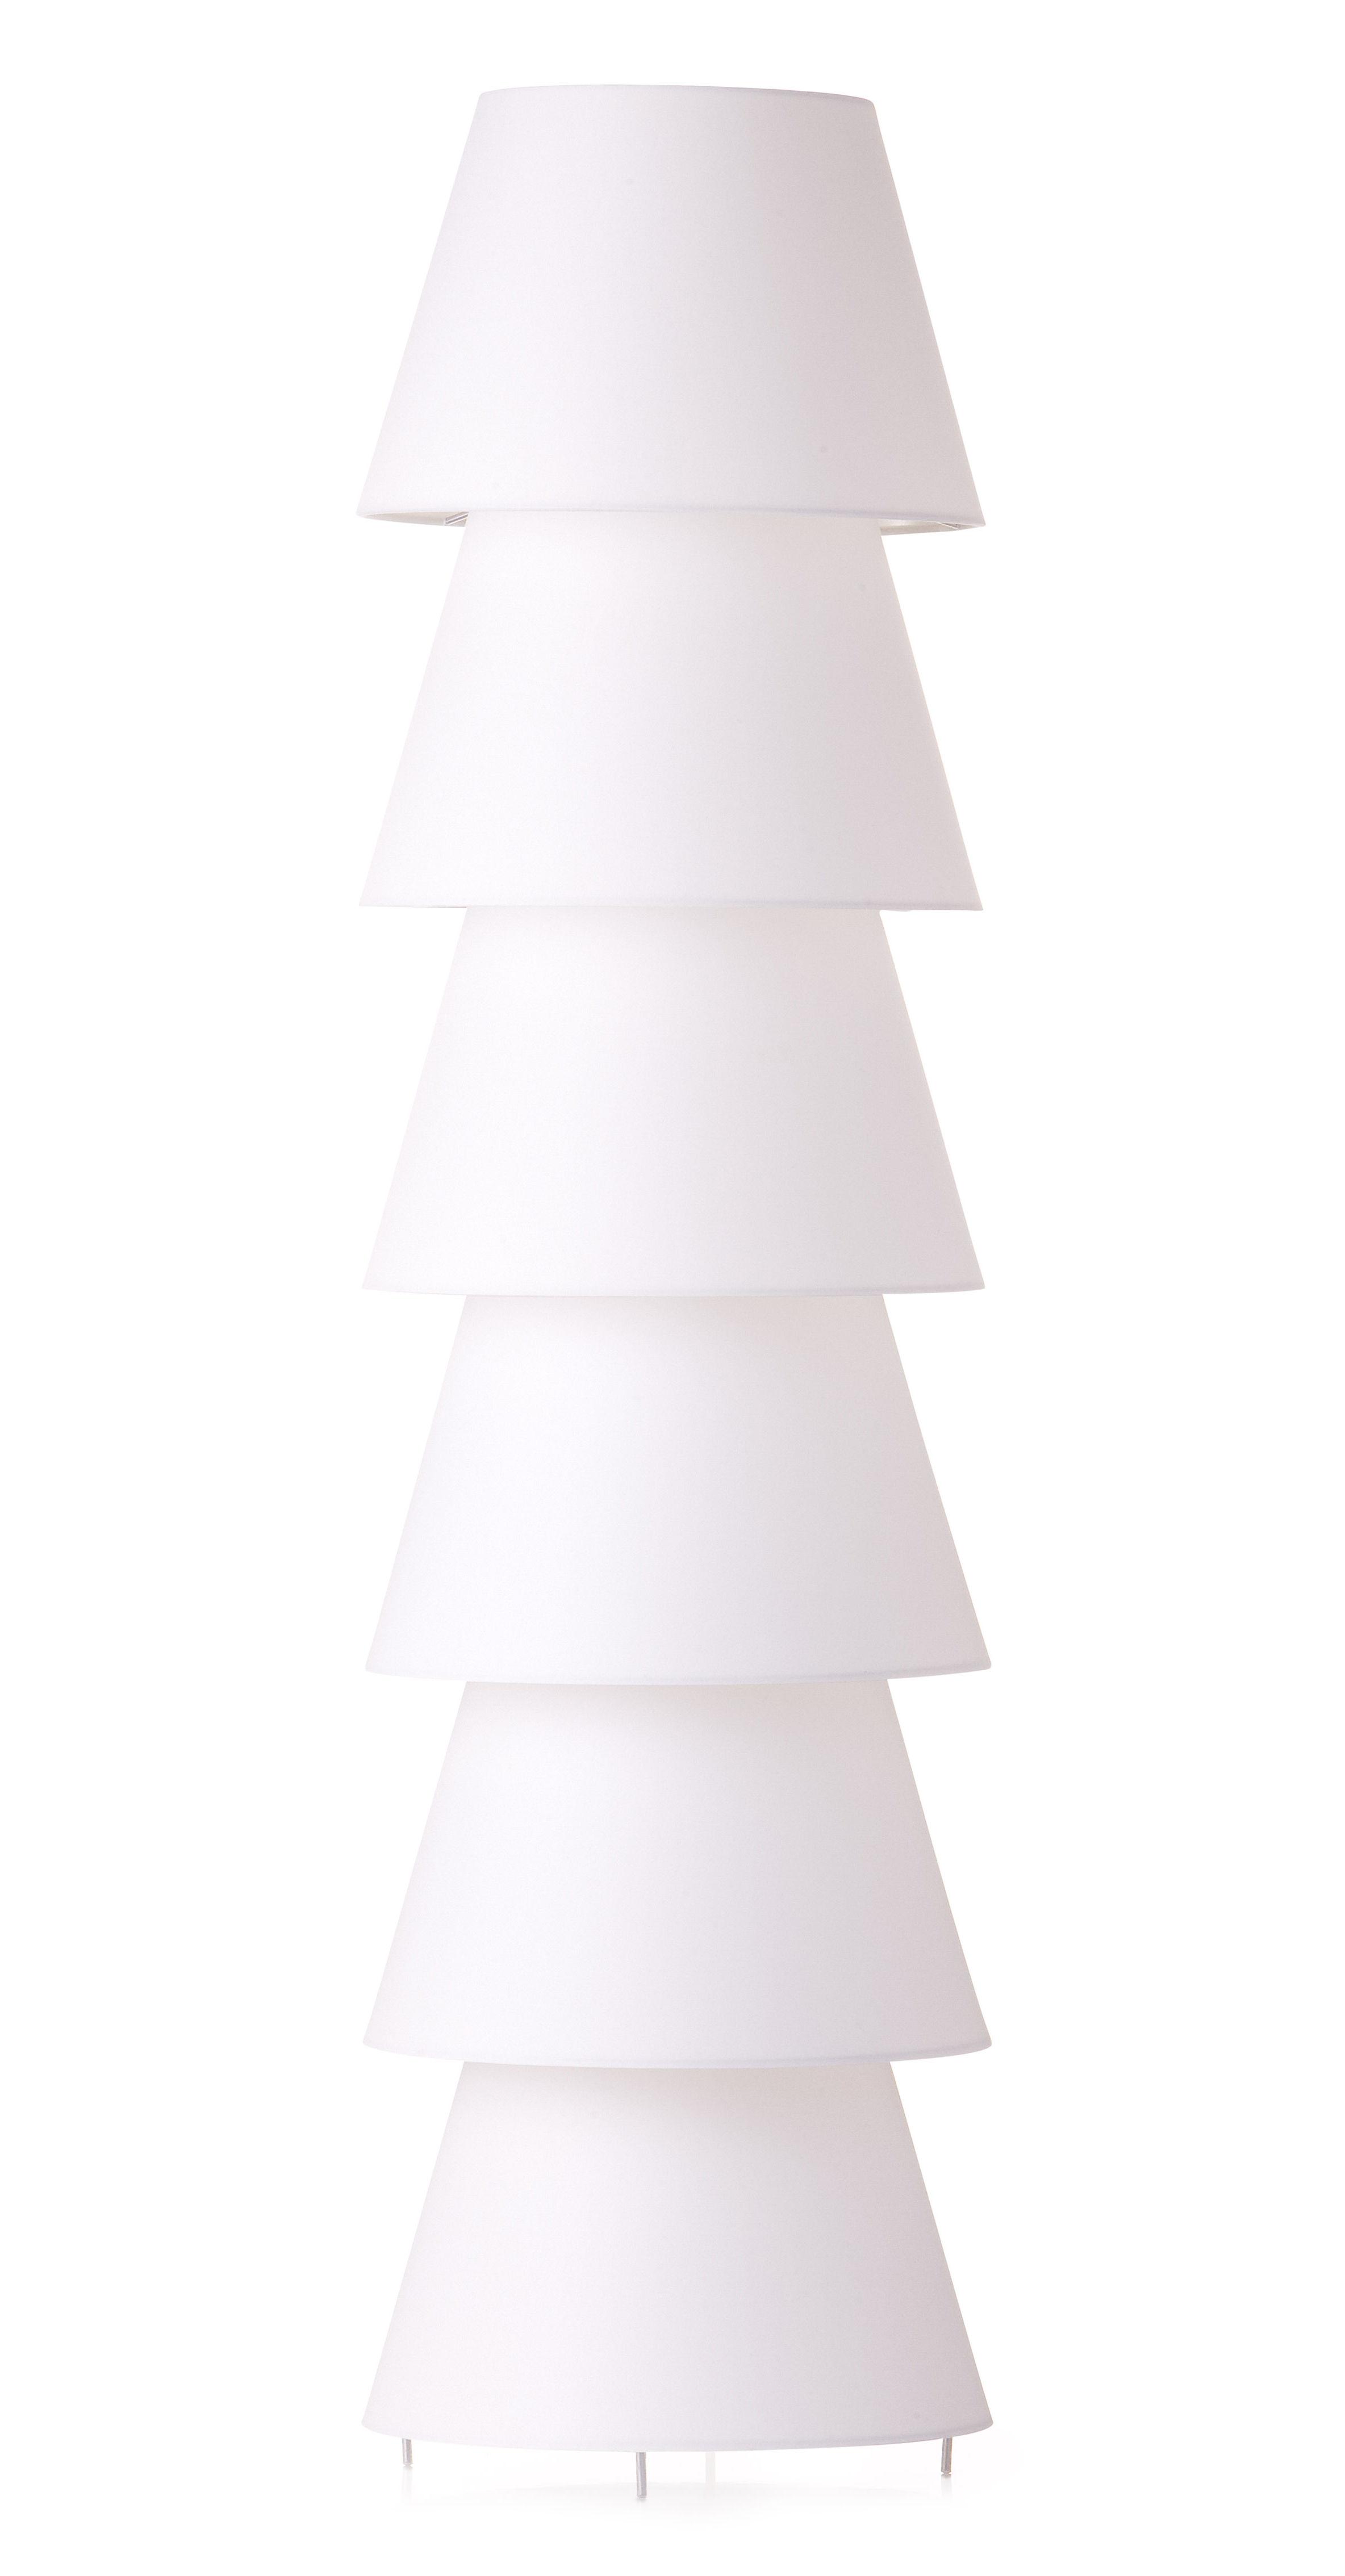 Luminaire - Lampadaires - Lampadaire Set Up Shade - Moooi - H 116 cm - Coton